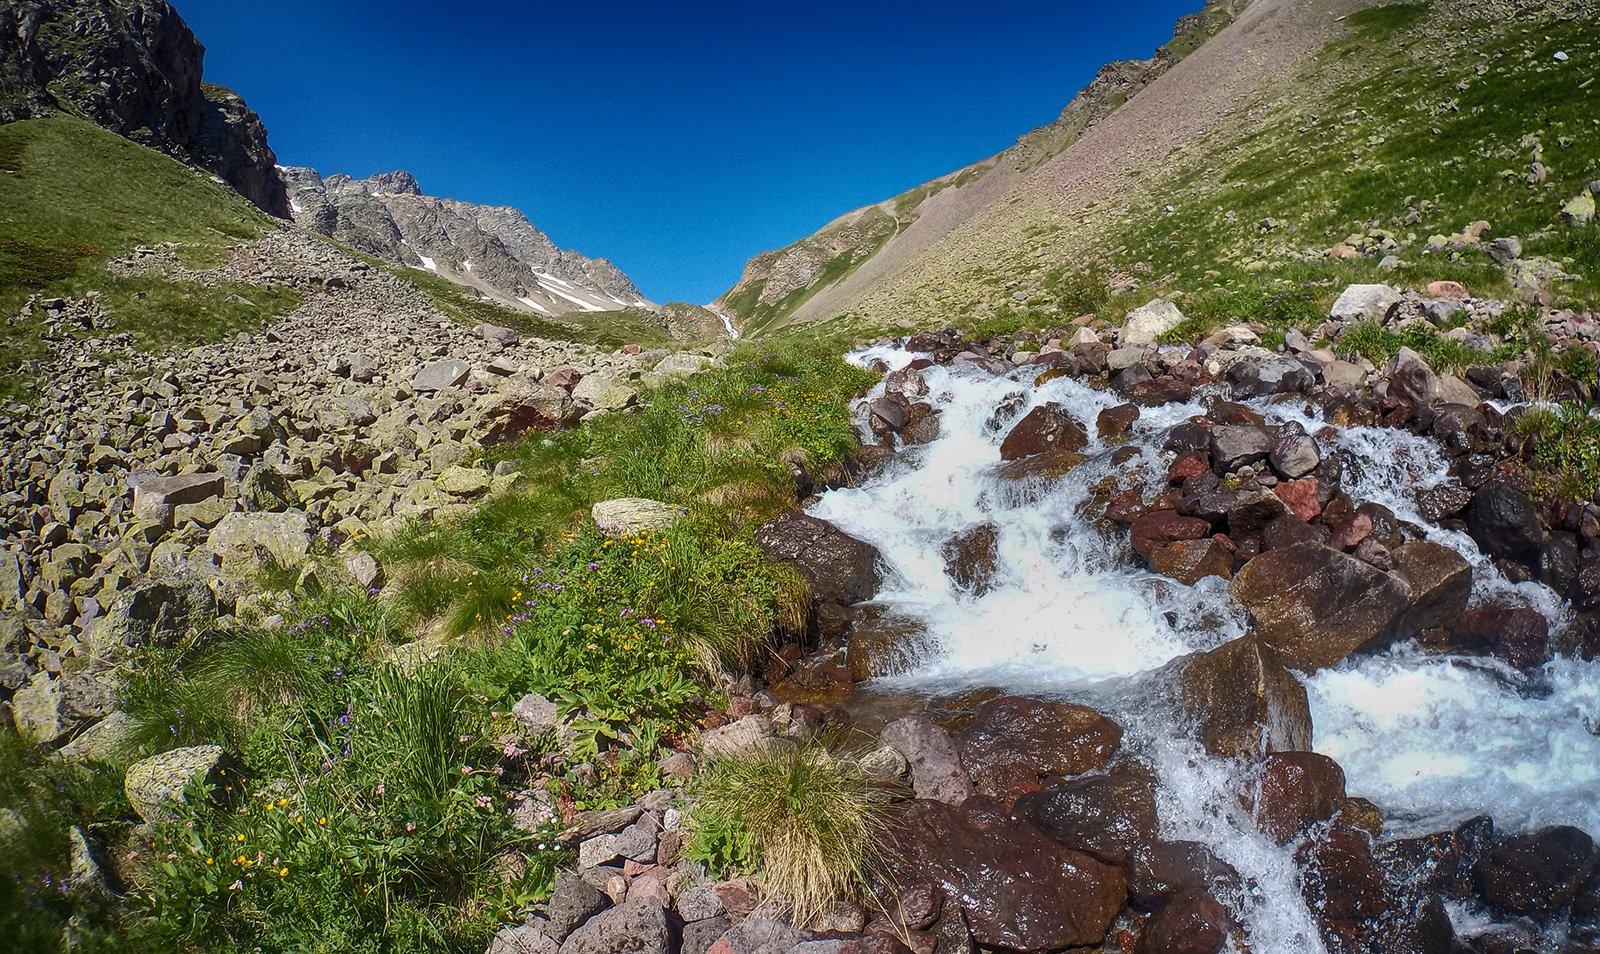 река Сыльтран-су